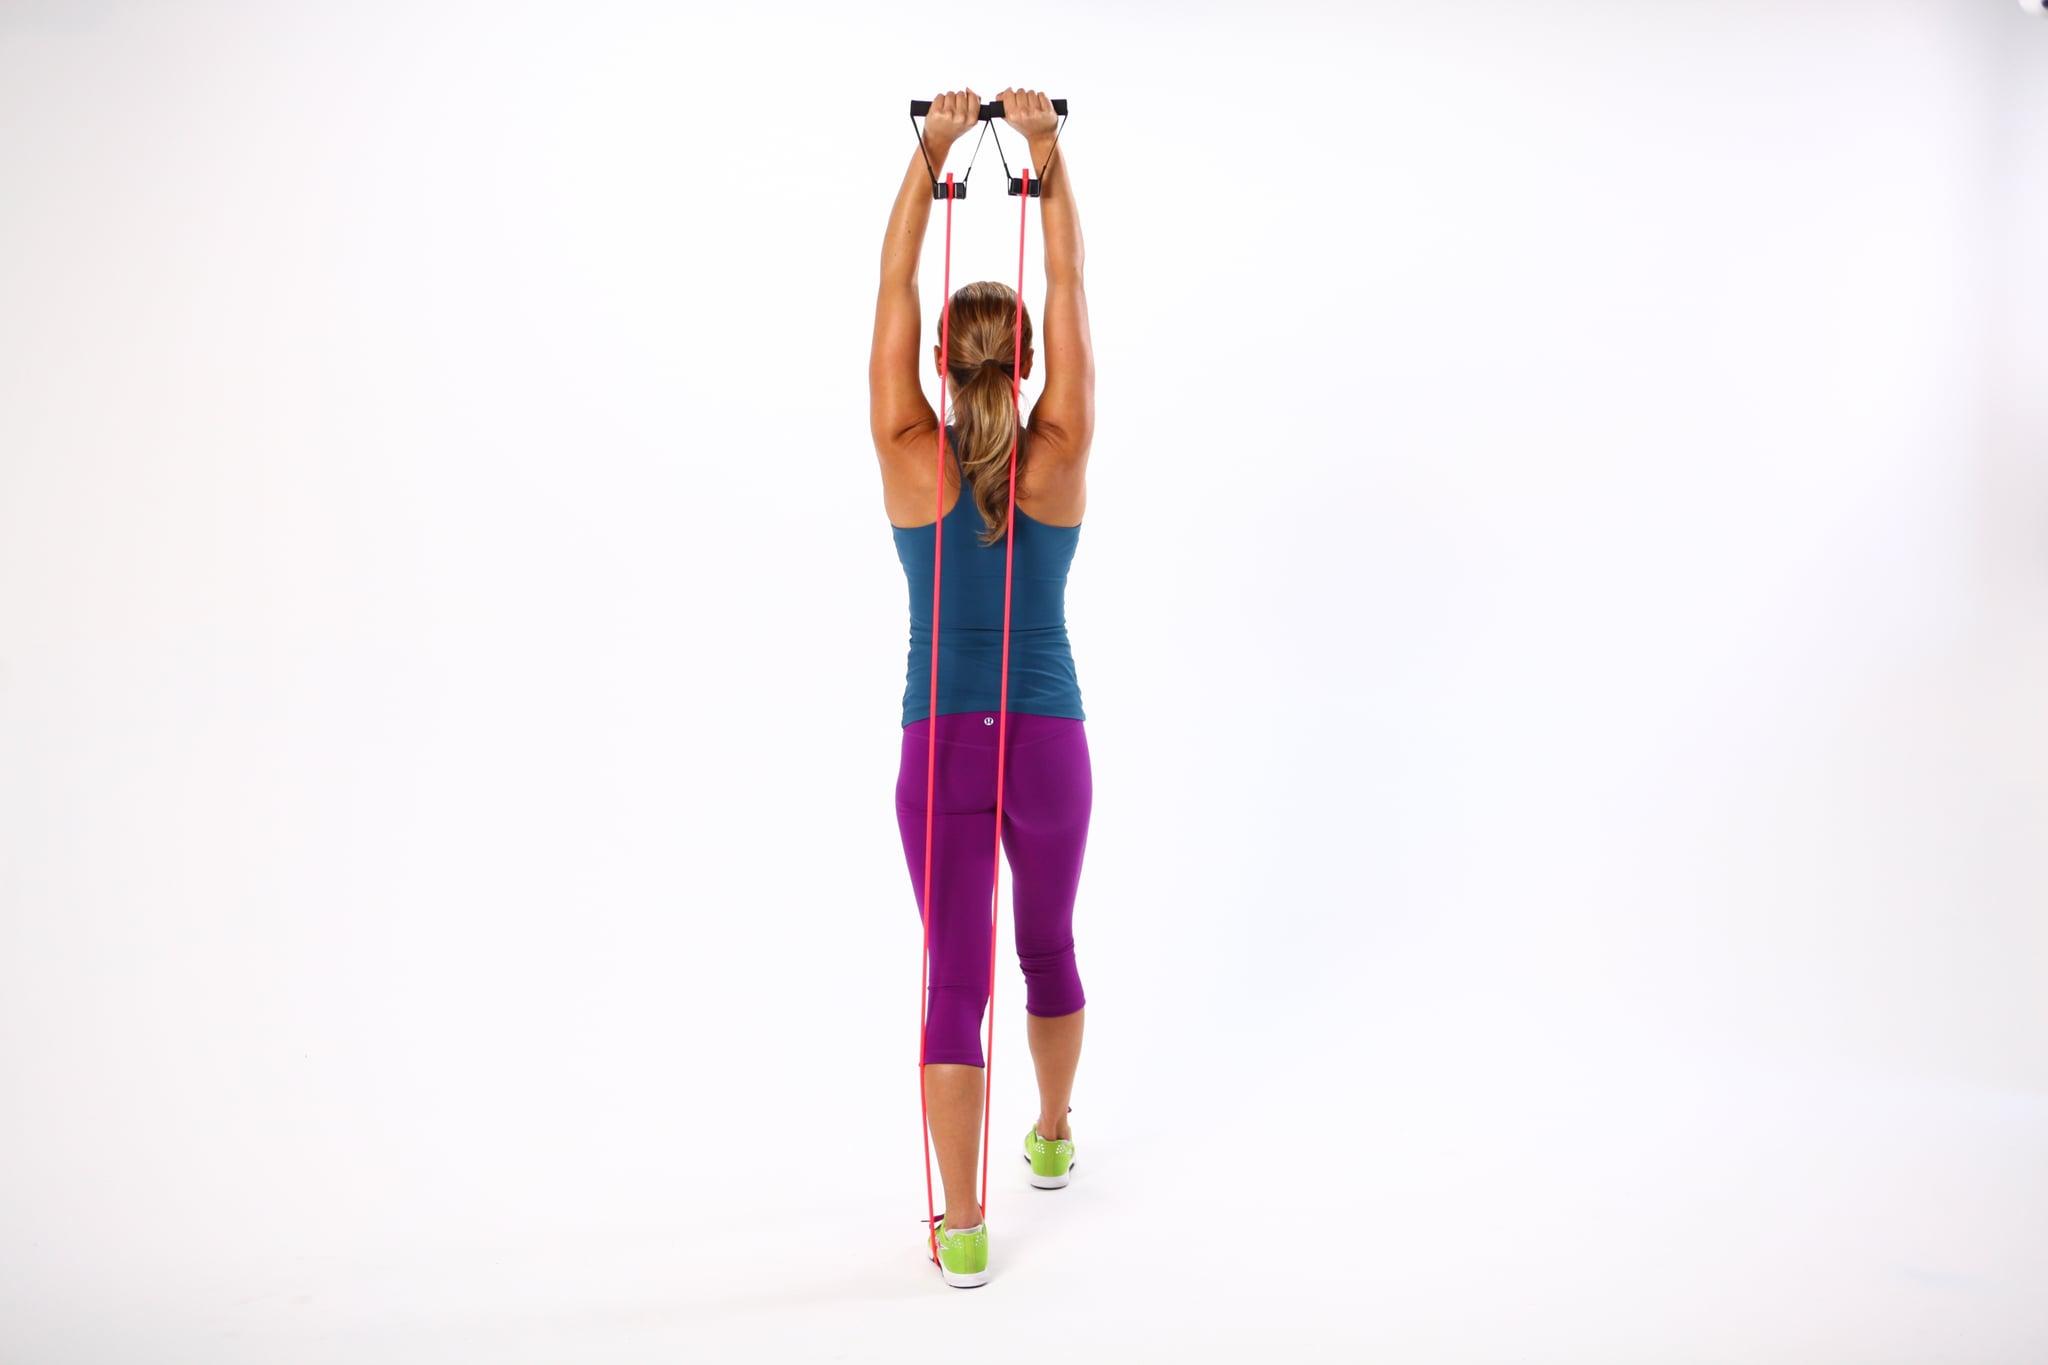 1a: Triceps Pressdown